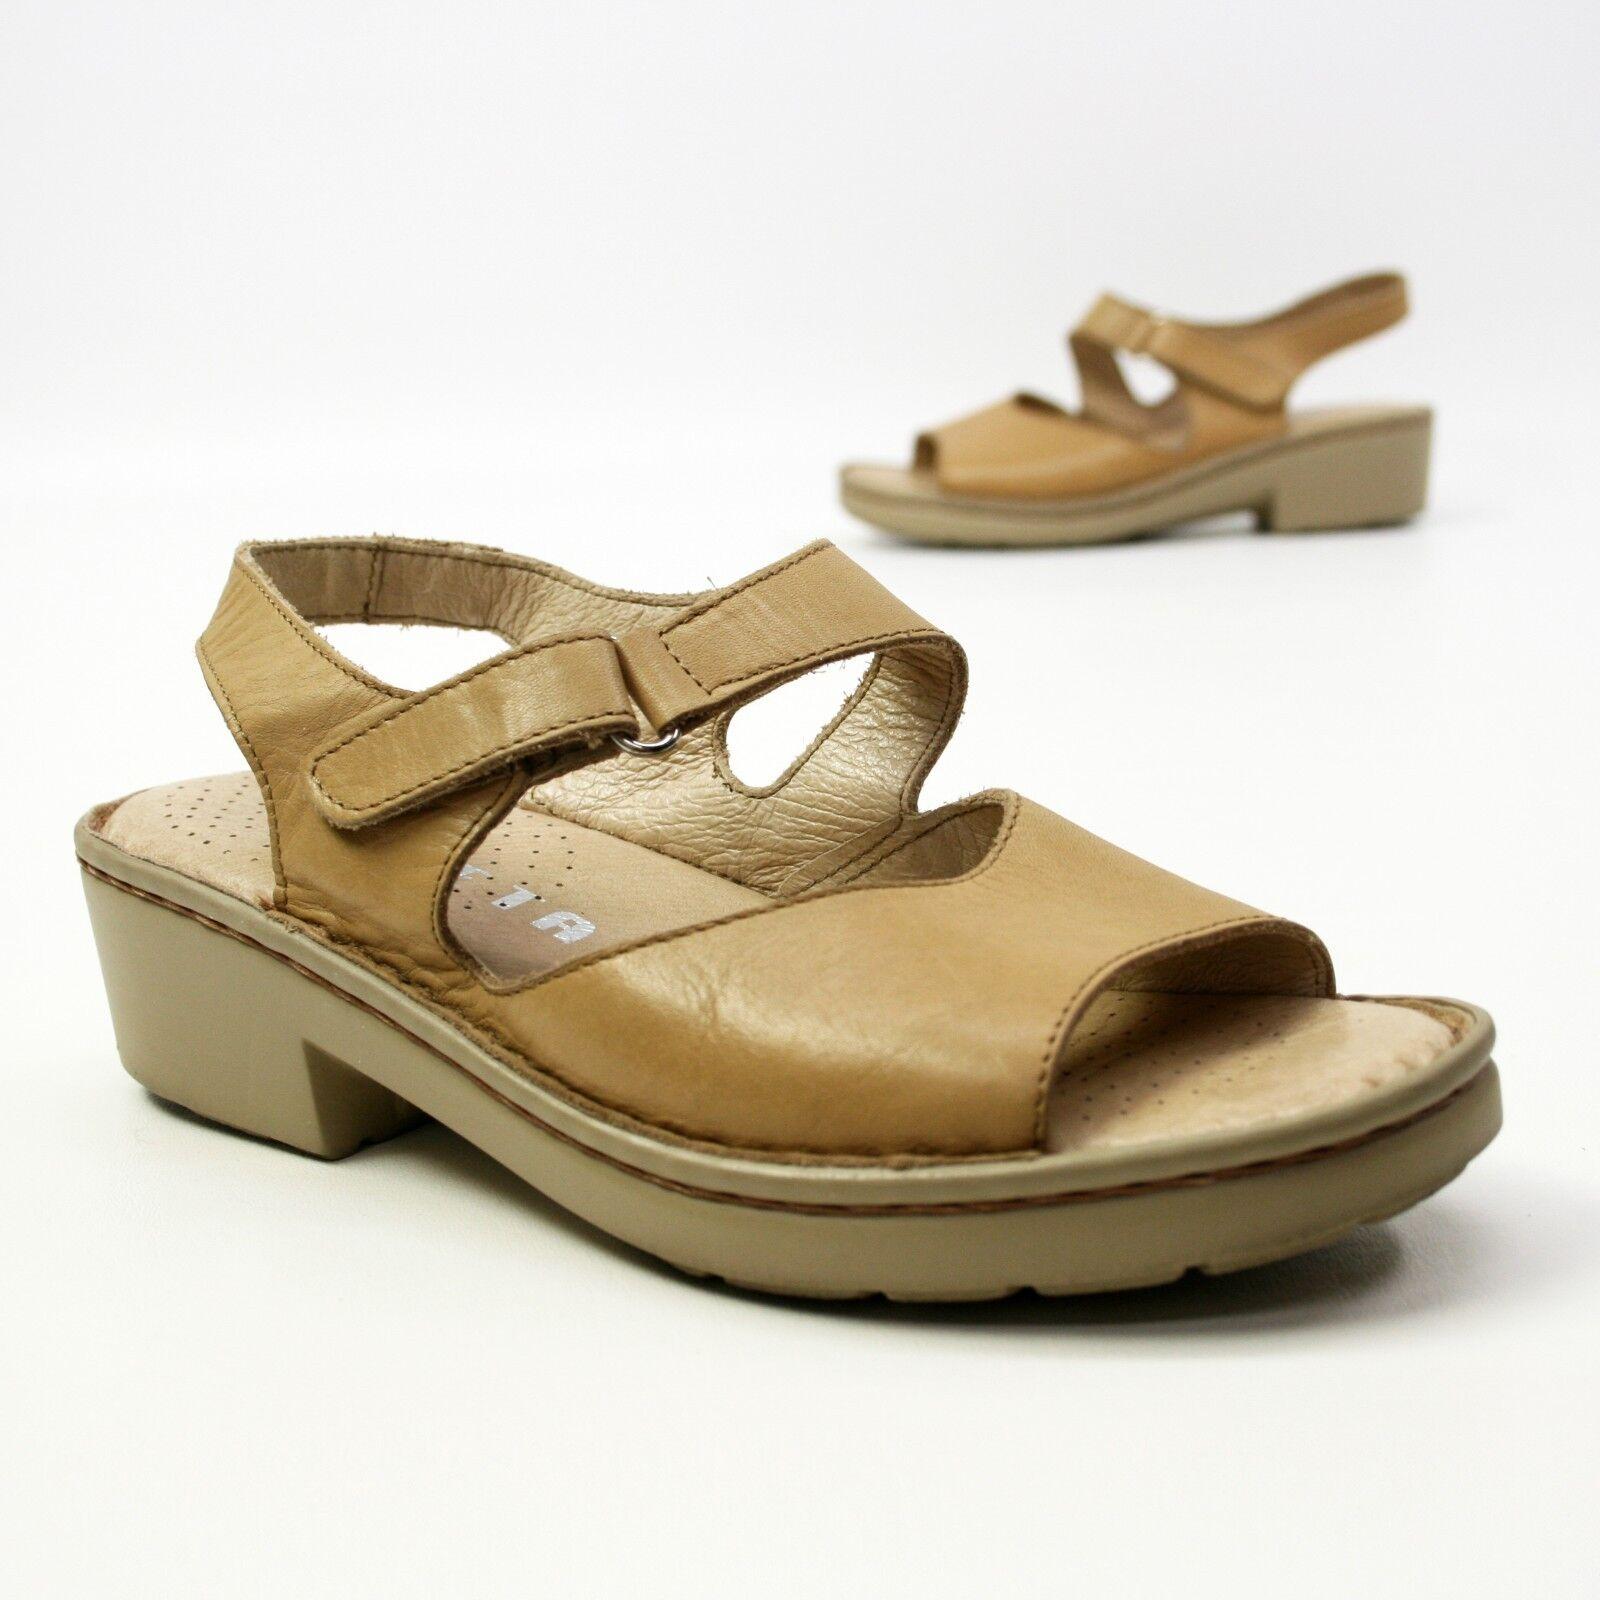 Zeeta 9.5 Ladies Size 40 (about 9.5 Zeeta US) Tan Leather Adjustable Ankle Strap Sandals fff8a7